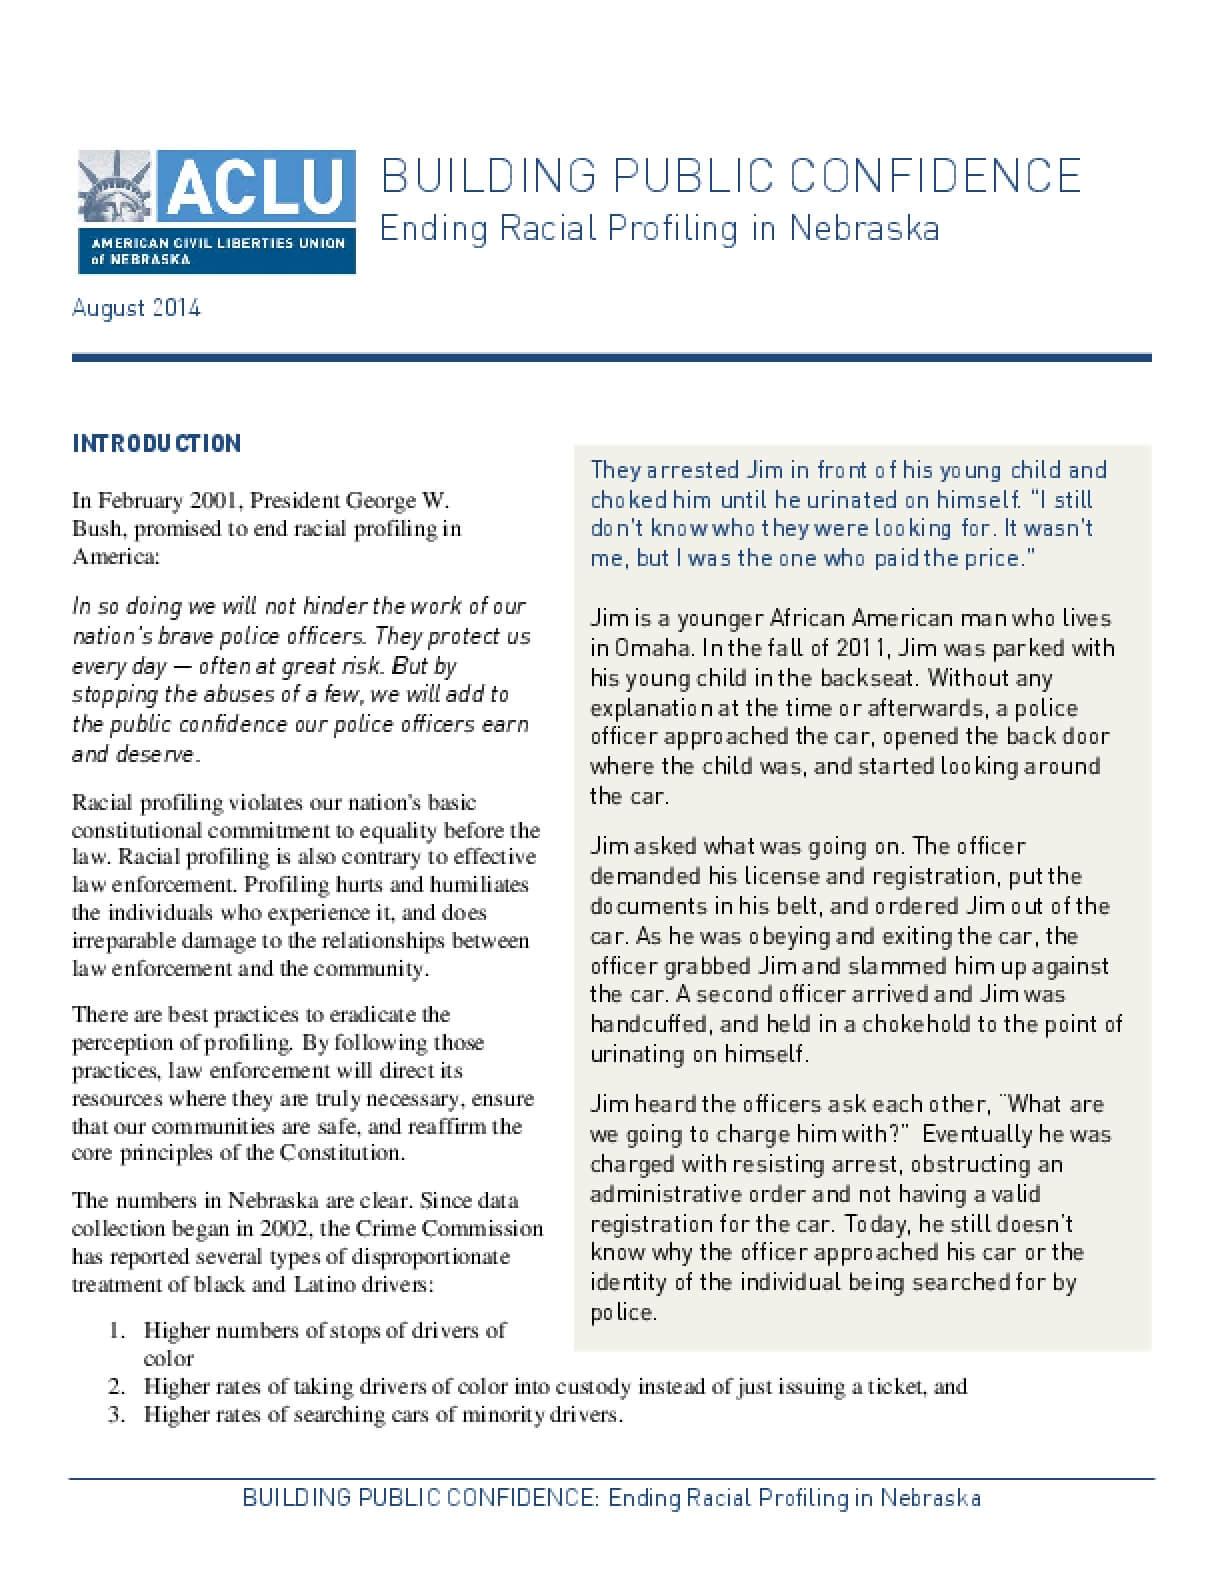 Building Public Confidence: Ending Racial Profiling in Nebraska